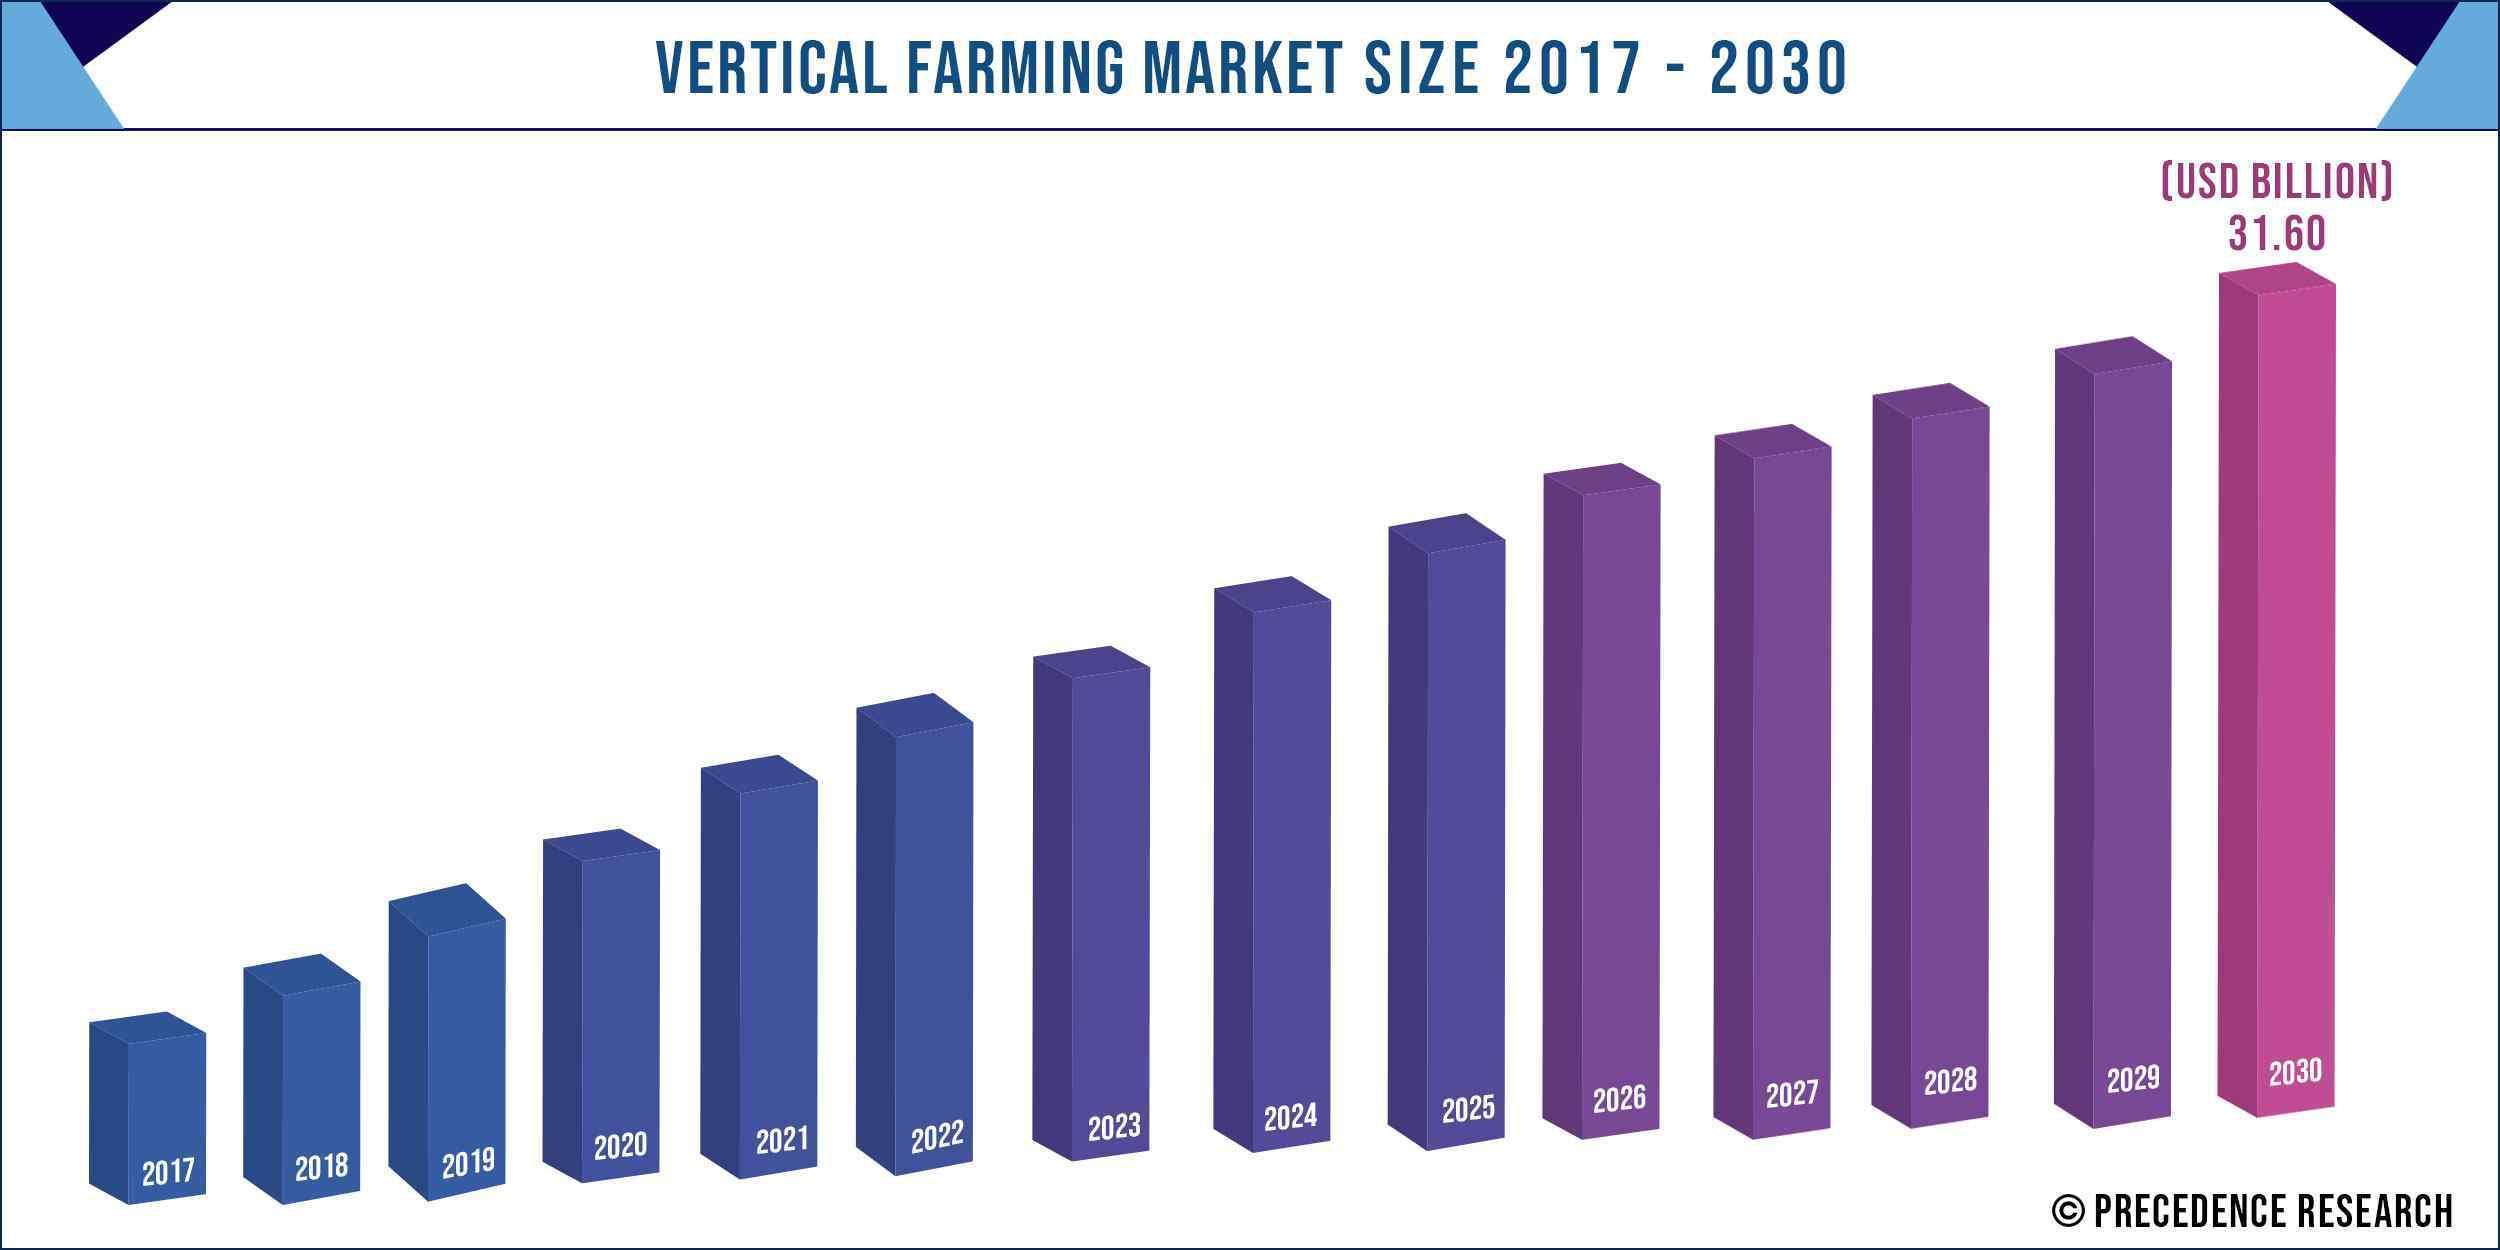 Vertical Farming Market Size 2017-2030